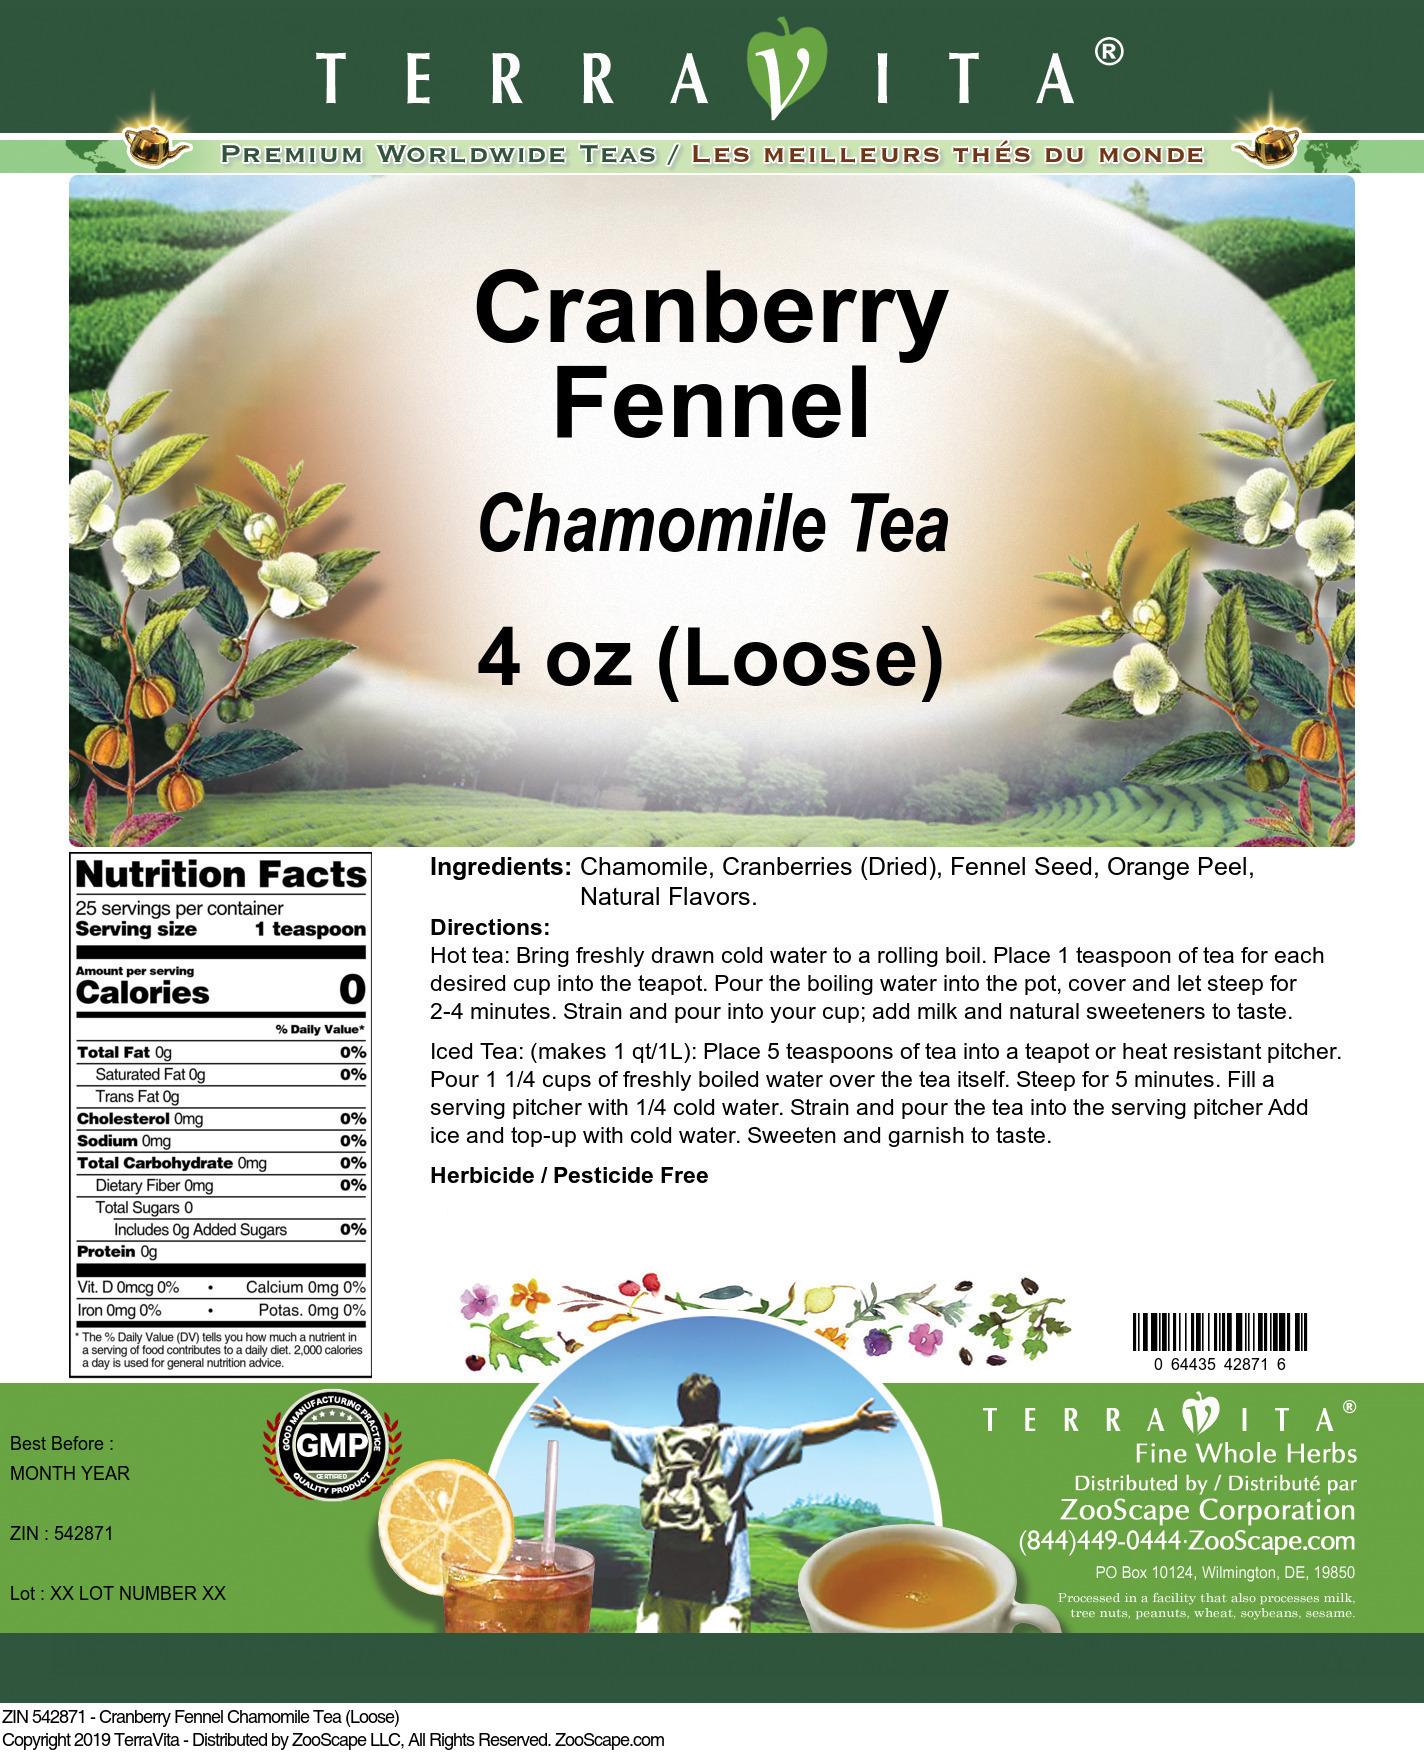 Cranberry Fennel Chamomile Tea (Loose)